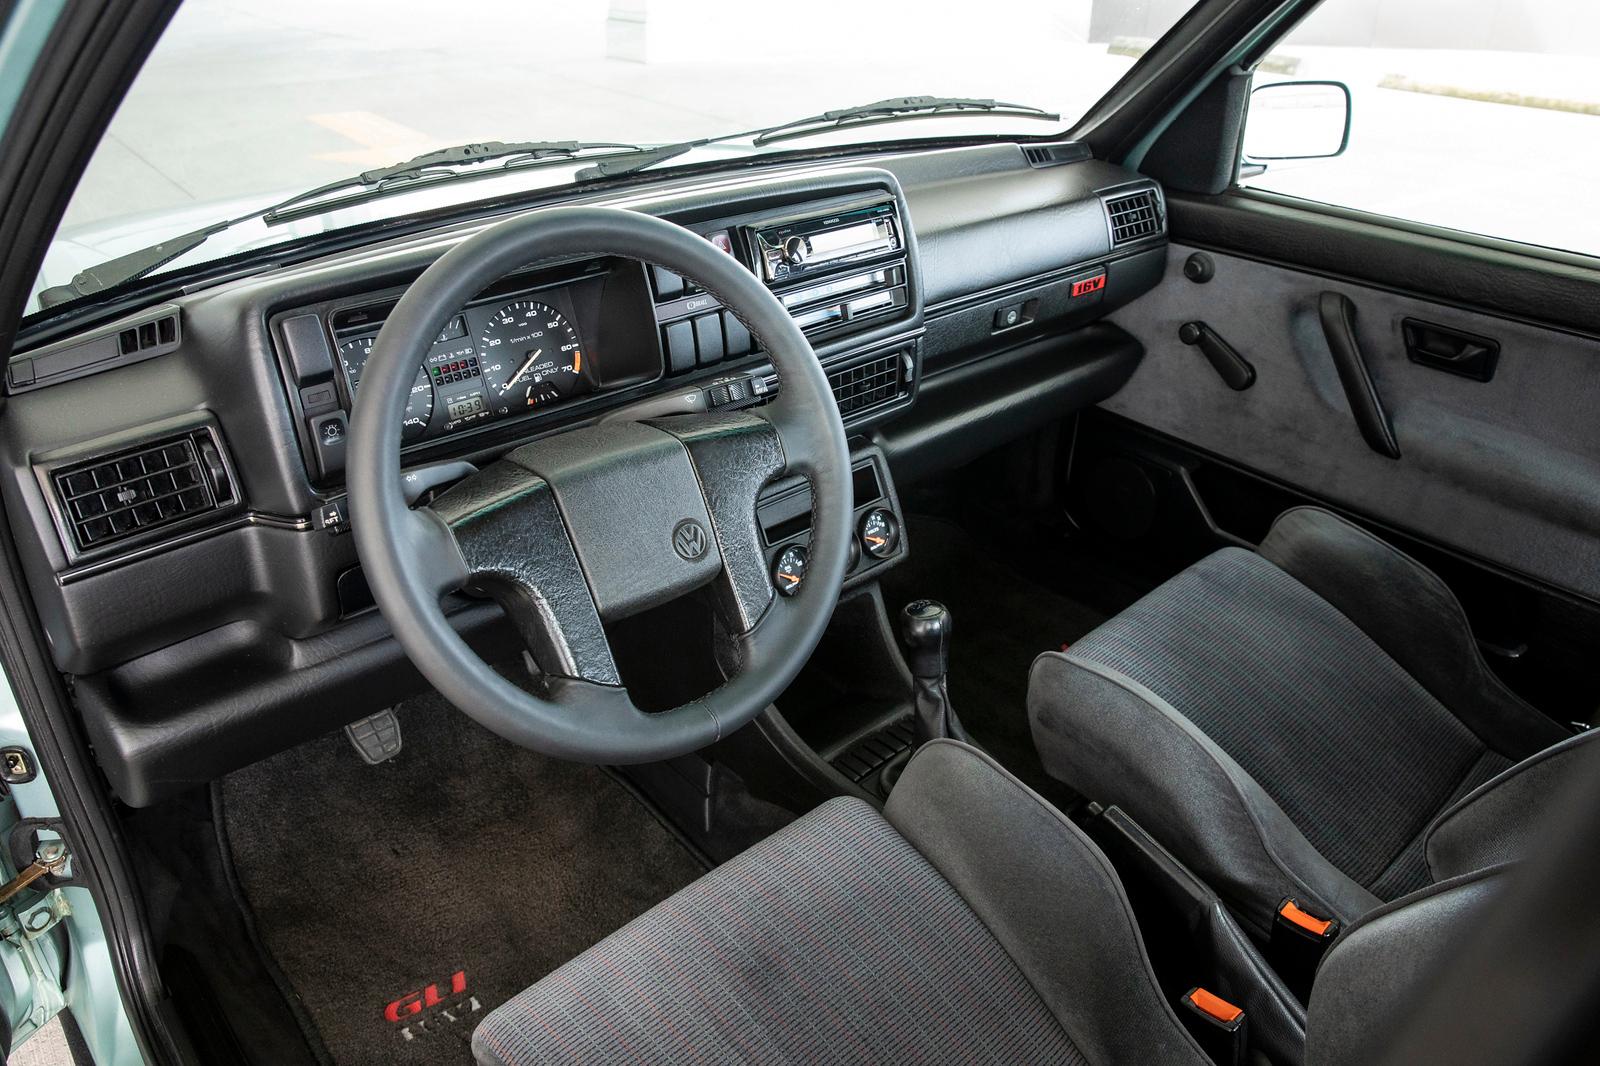 Audi-R8-V10-plus-MSS-2015-440